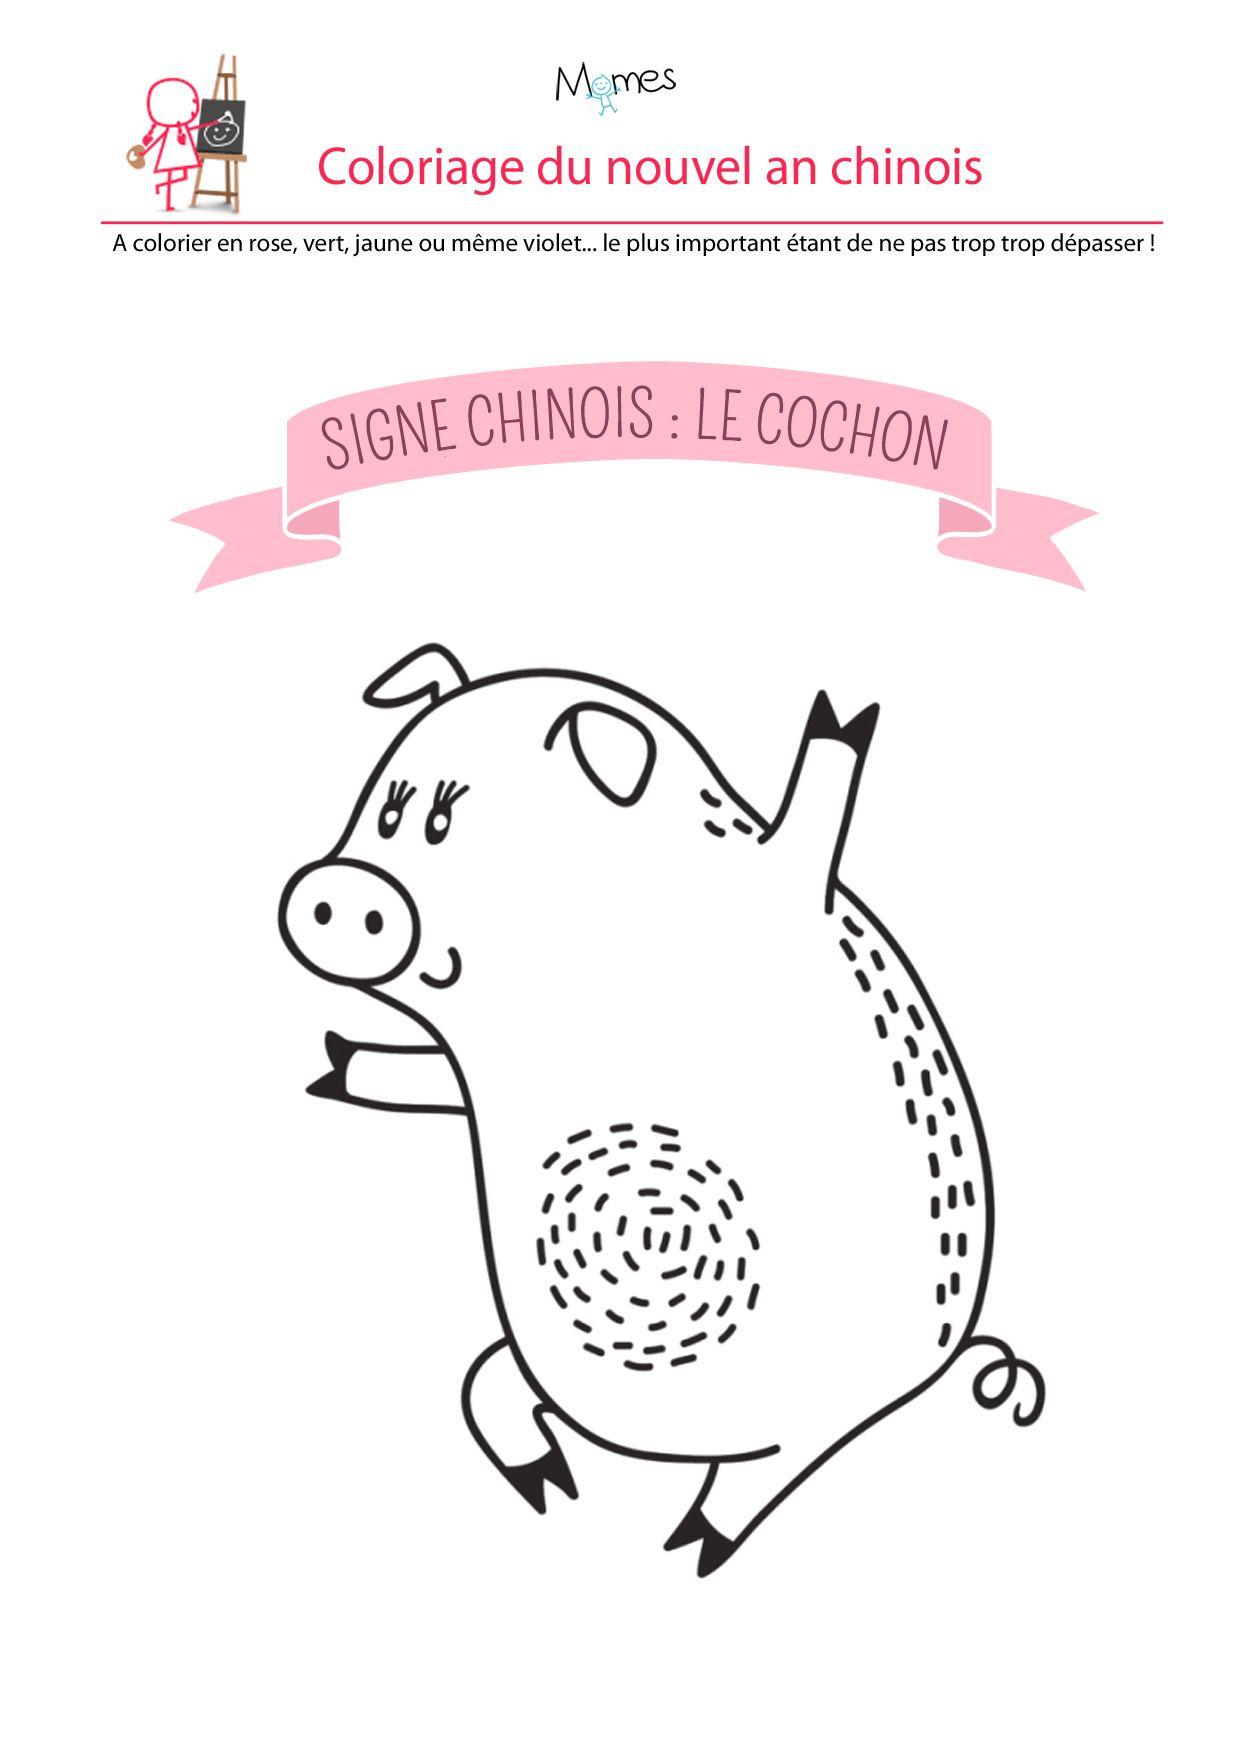 Coloriage du calendrier chinois : le cochon | Calendrier chinois ...